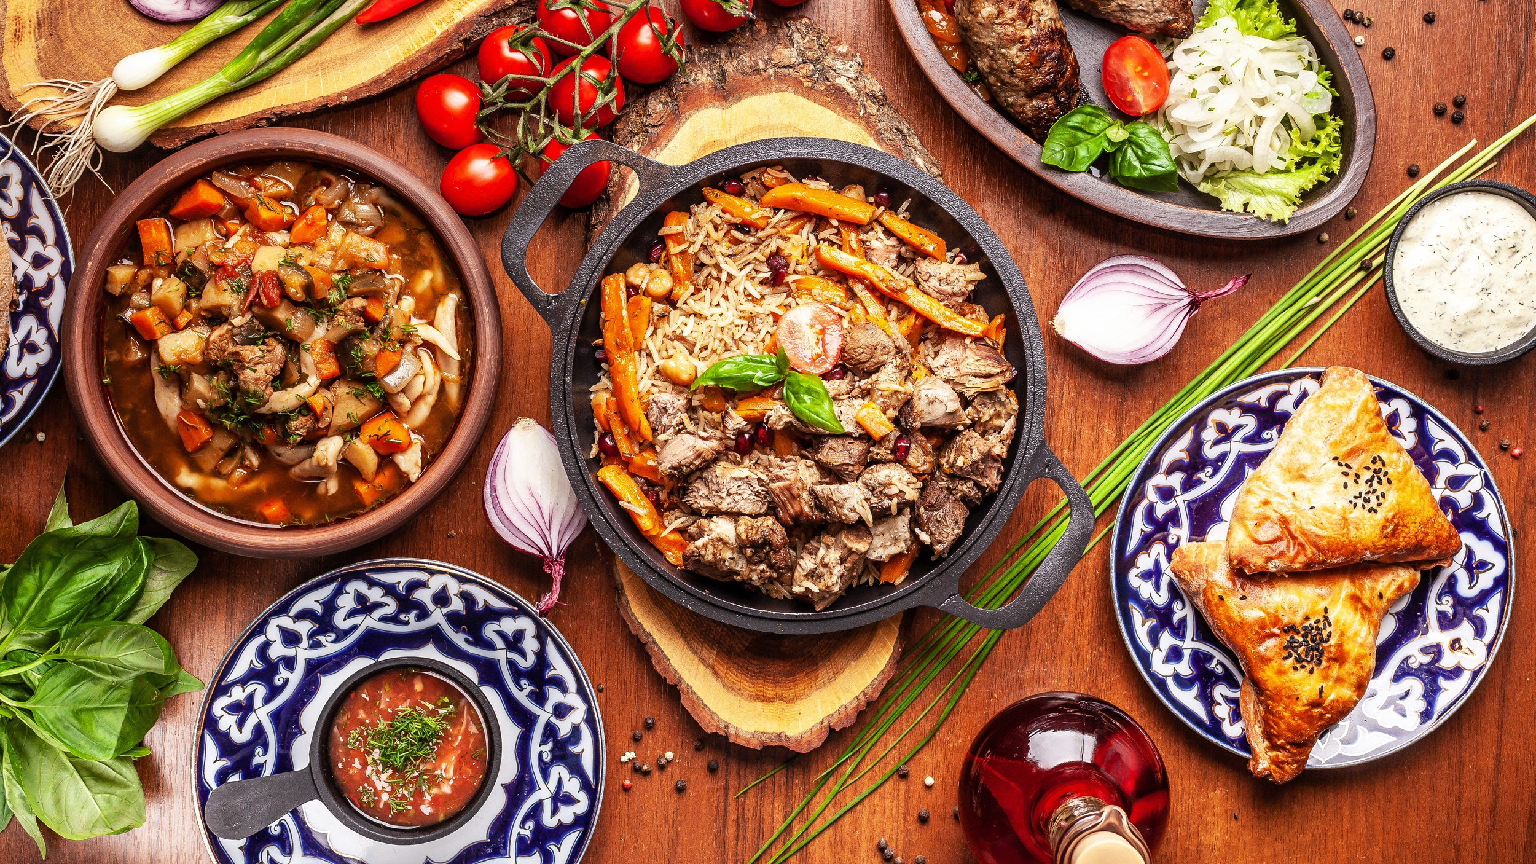 Is the food in Azerbaijan safe